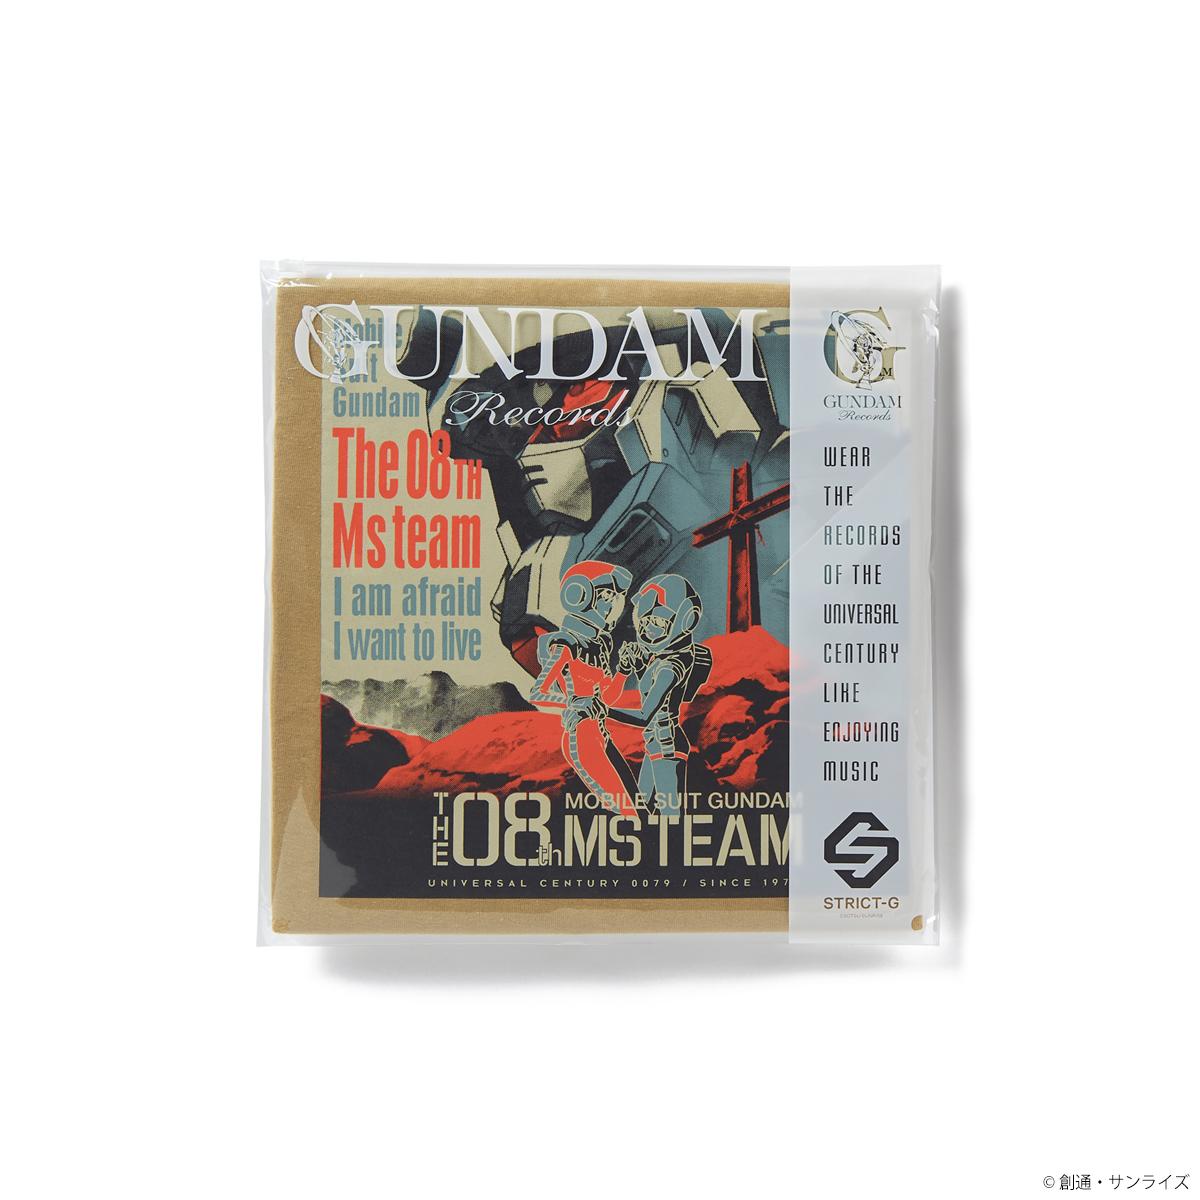 STRICT-G GUNDAM RECORDS『機動戦士ガンダム 第08MS小隊』Tシャツ